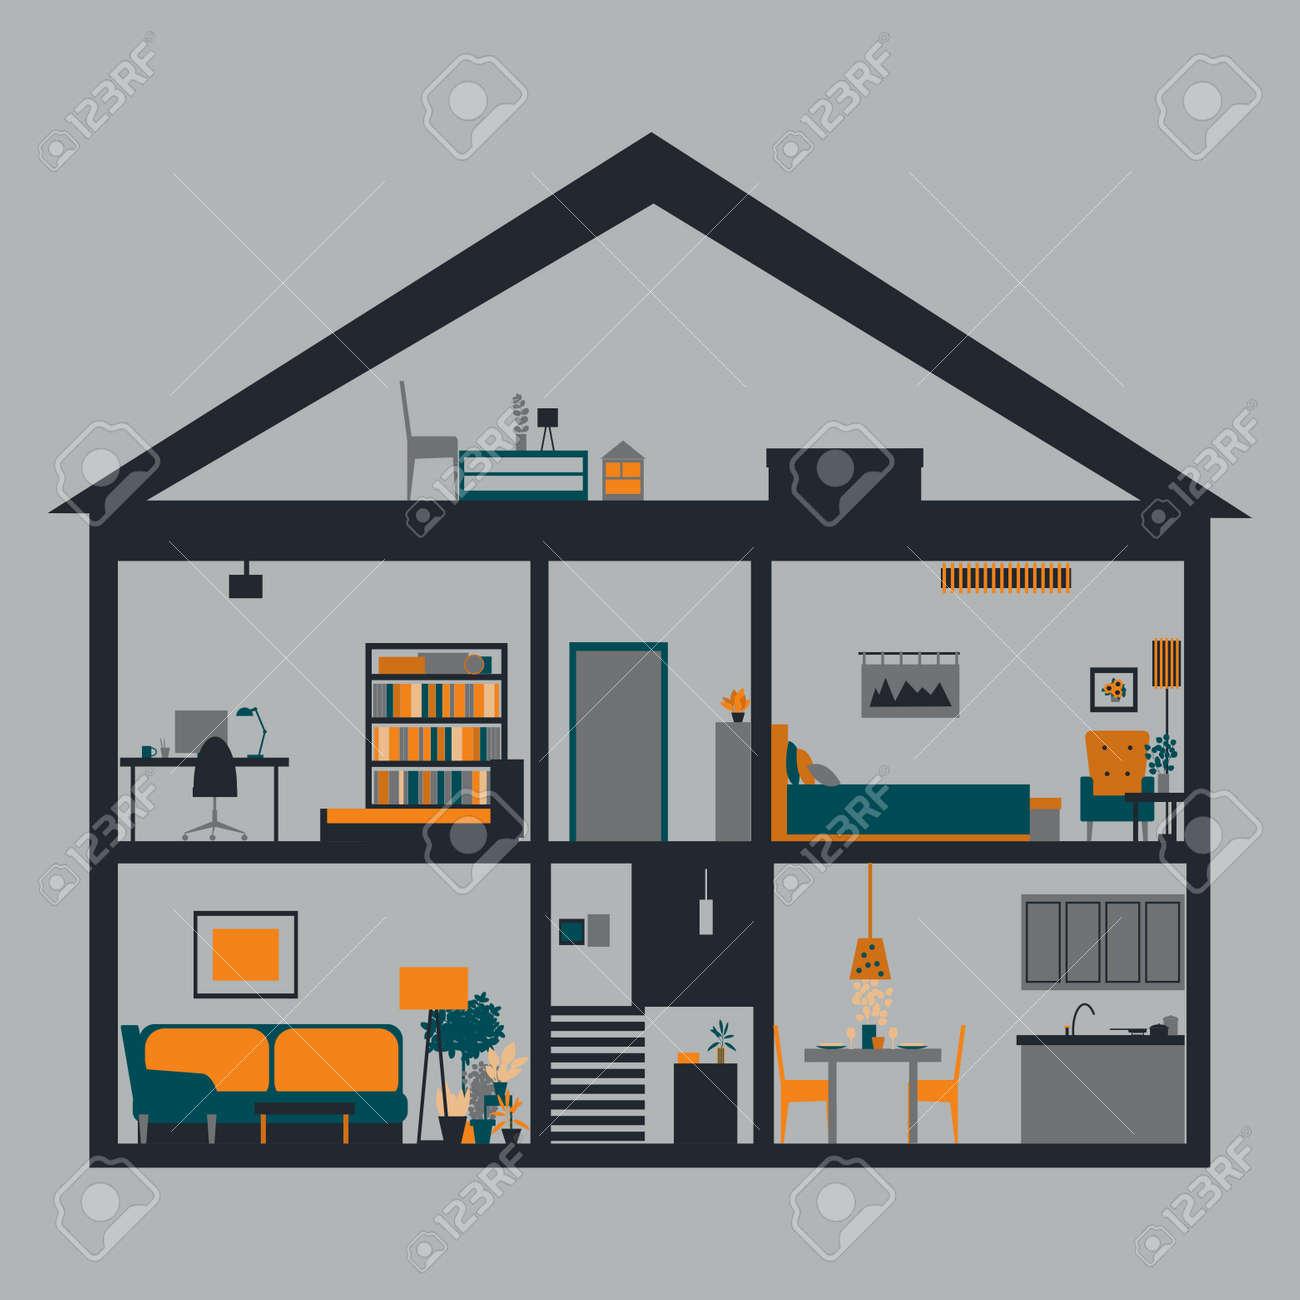 House in cut. Modern house interior.Vector illustration - 157982200